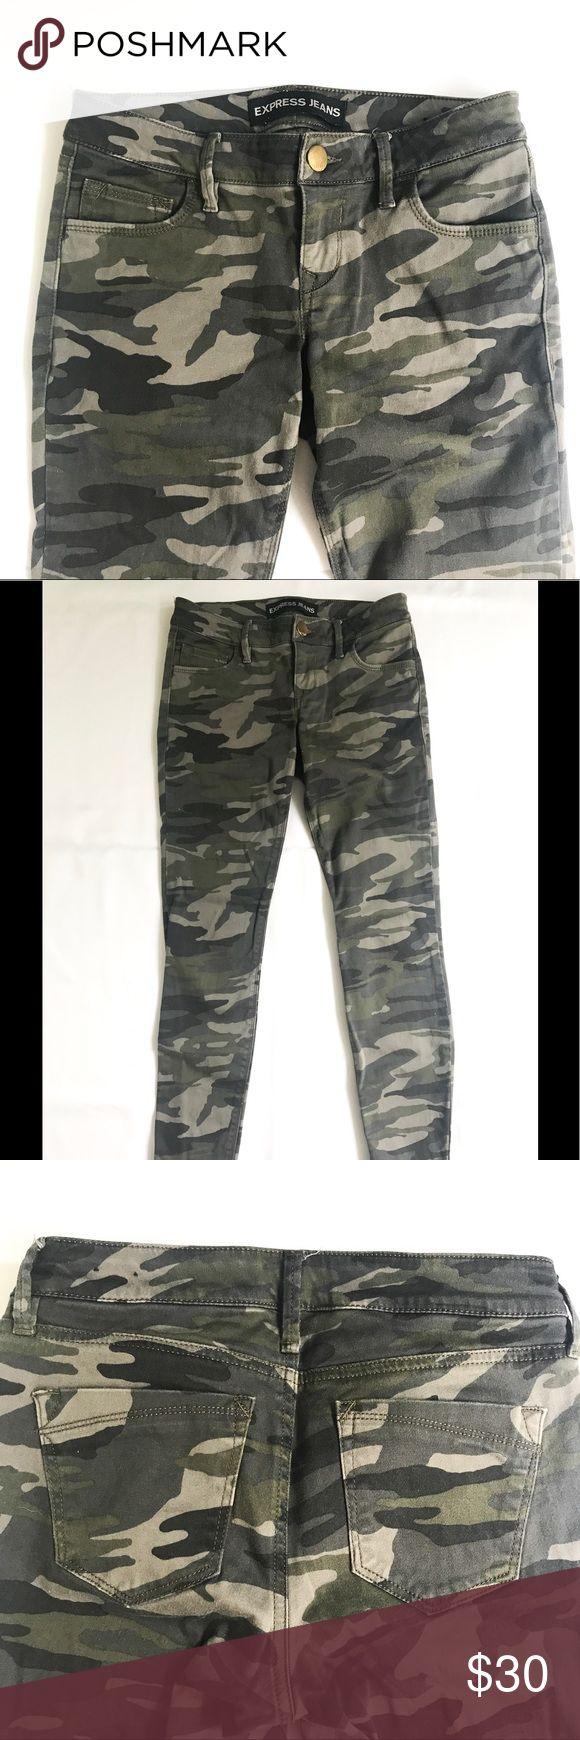 Express camo skinny pants Express camo skinny pants size 0.  Great condition! Express Pants Skinny